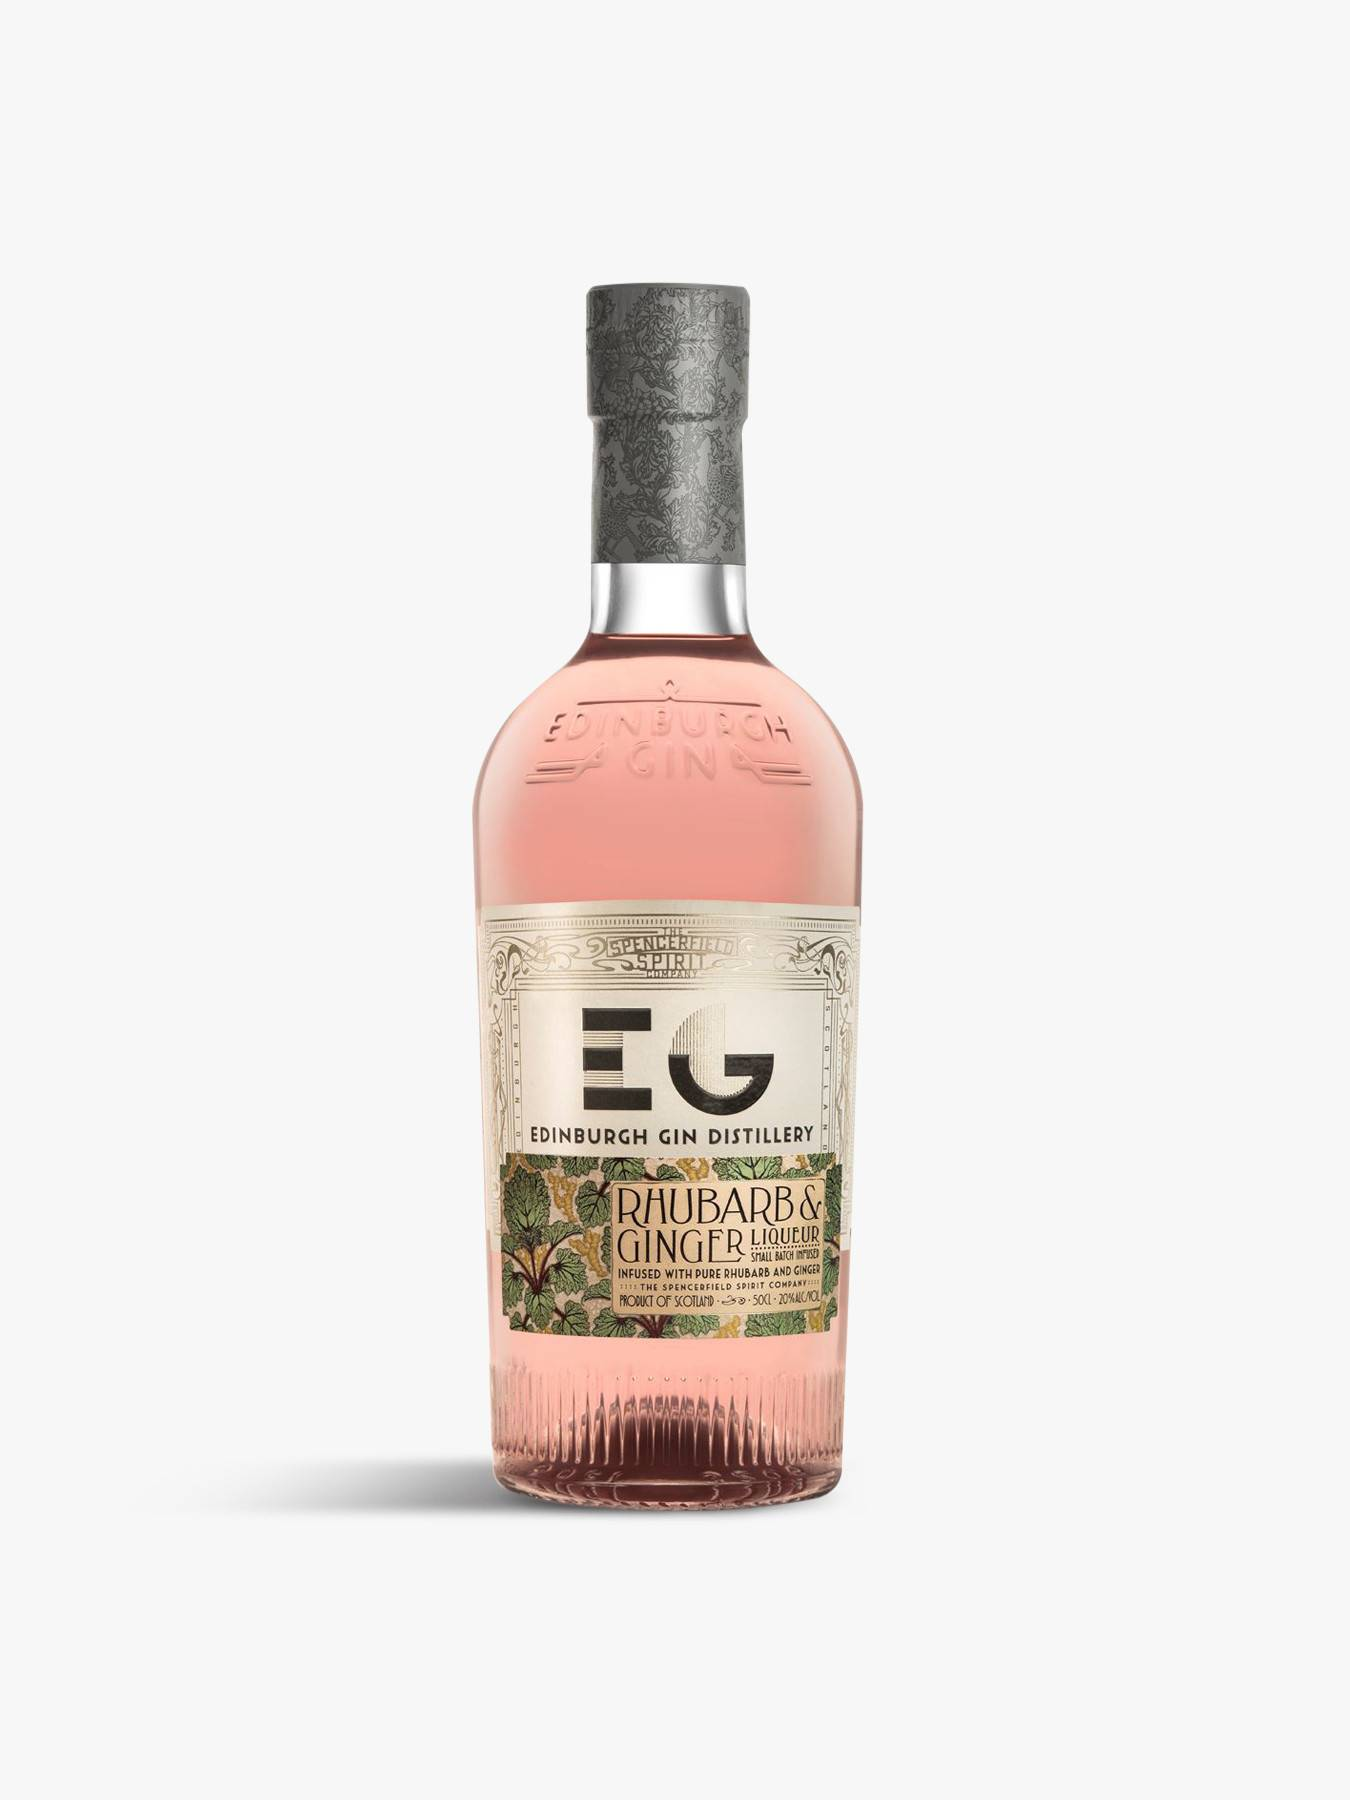 Edinburgh Rhubarb & Ginger Gin Gins & Gin Liqueurs